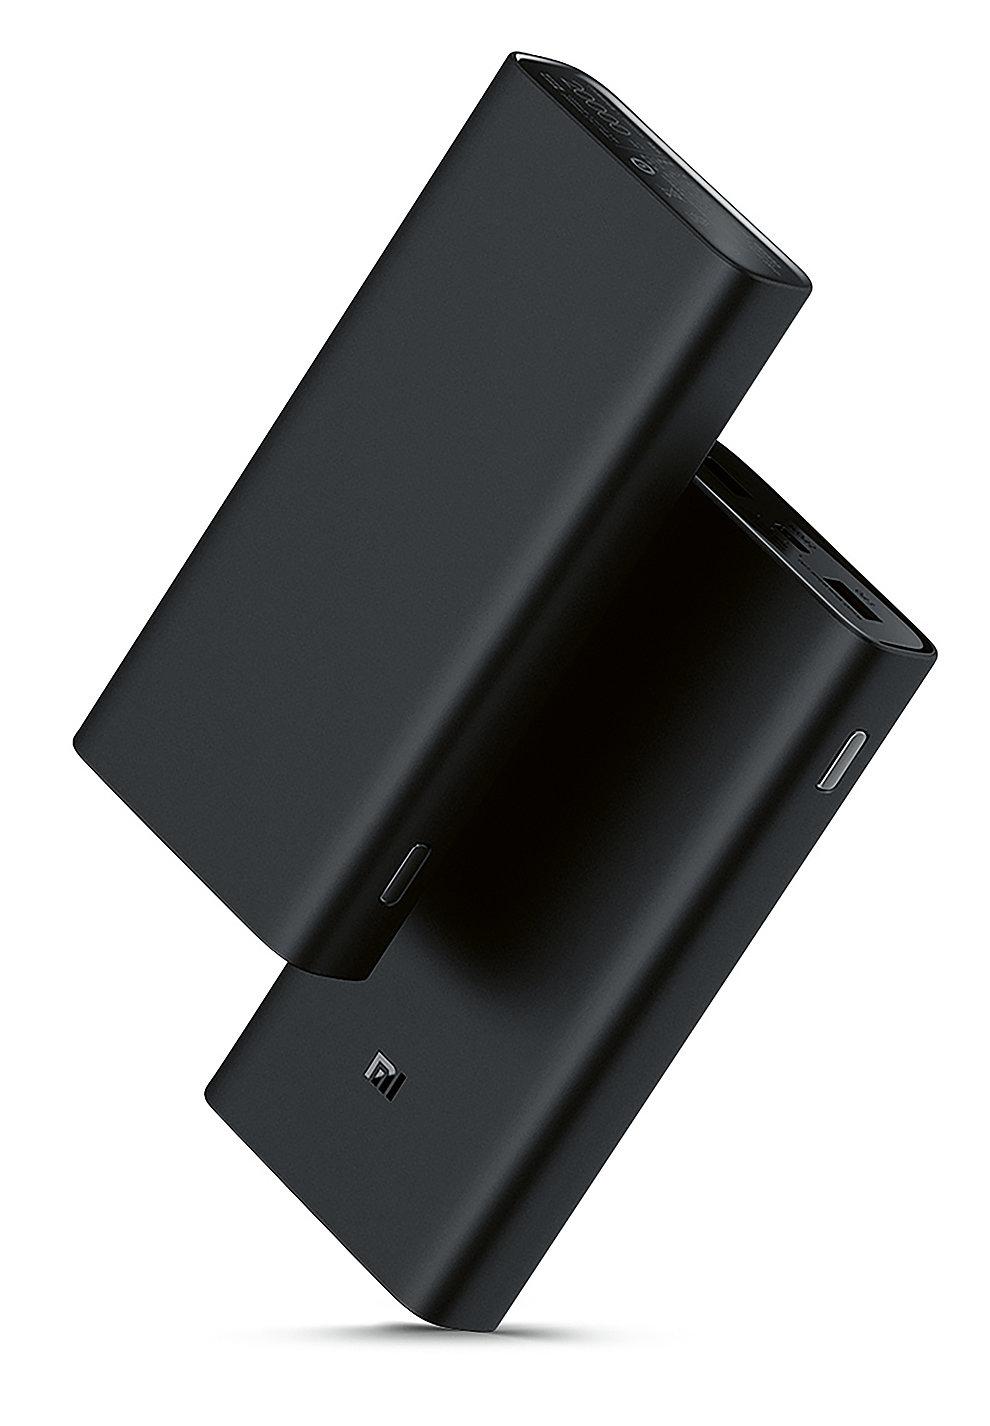 Xiaomi Laptop Powerbank | Red Dot Design Award